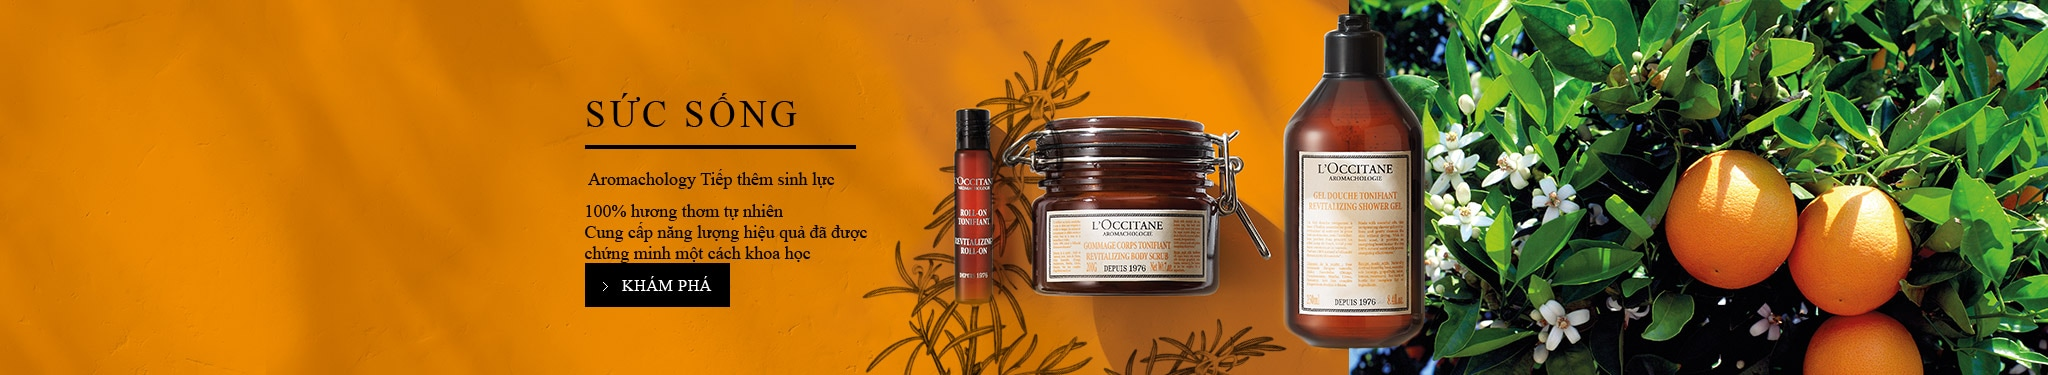 body care aroma